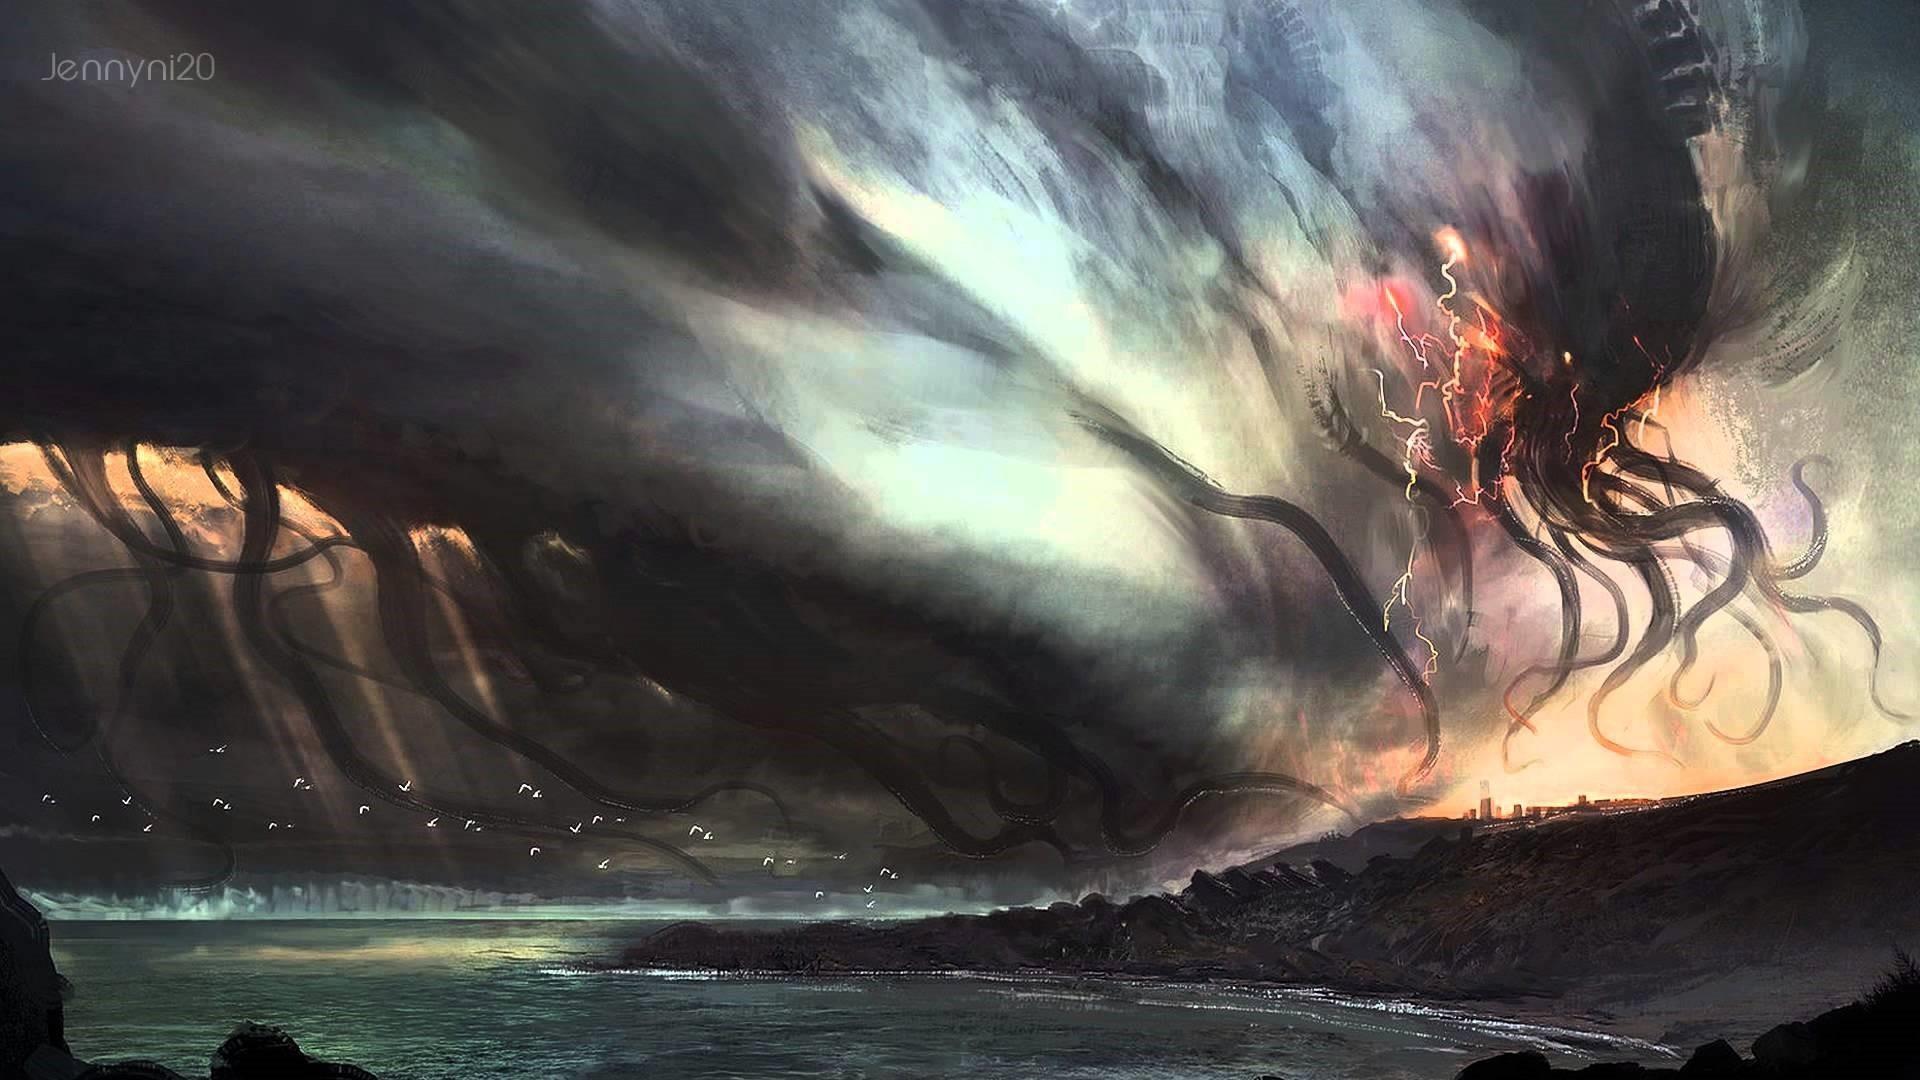 Lovecraft Wallpaper Free Download